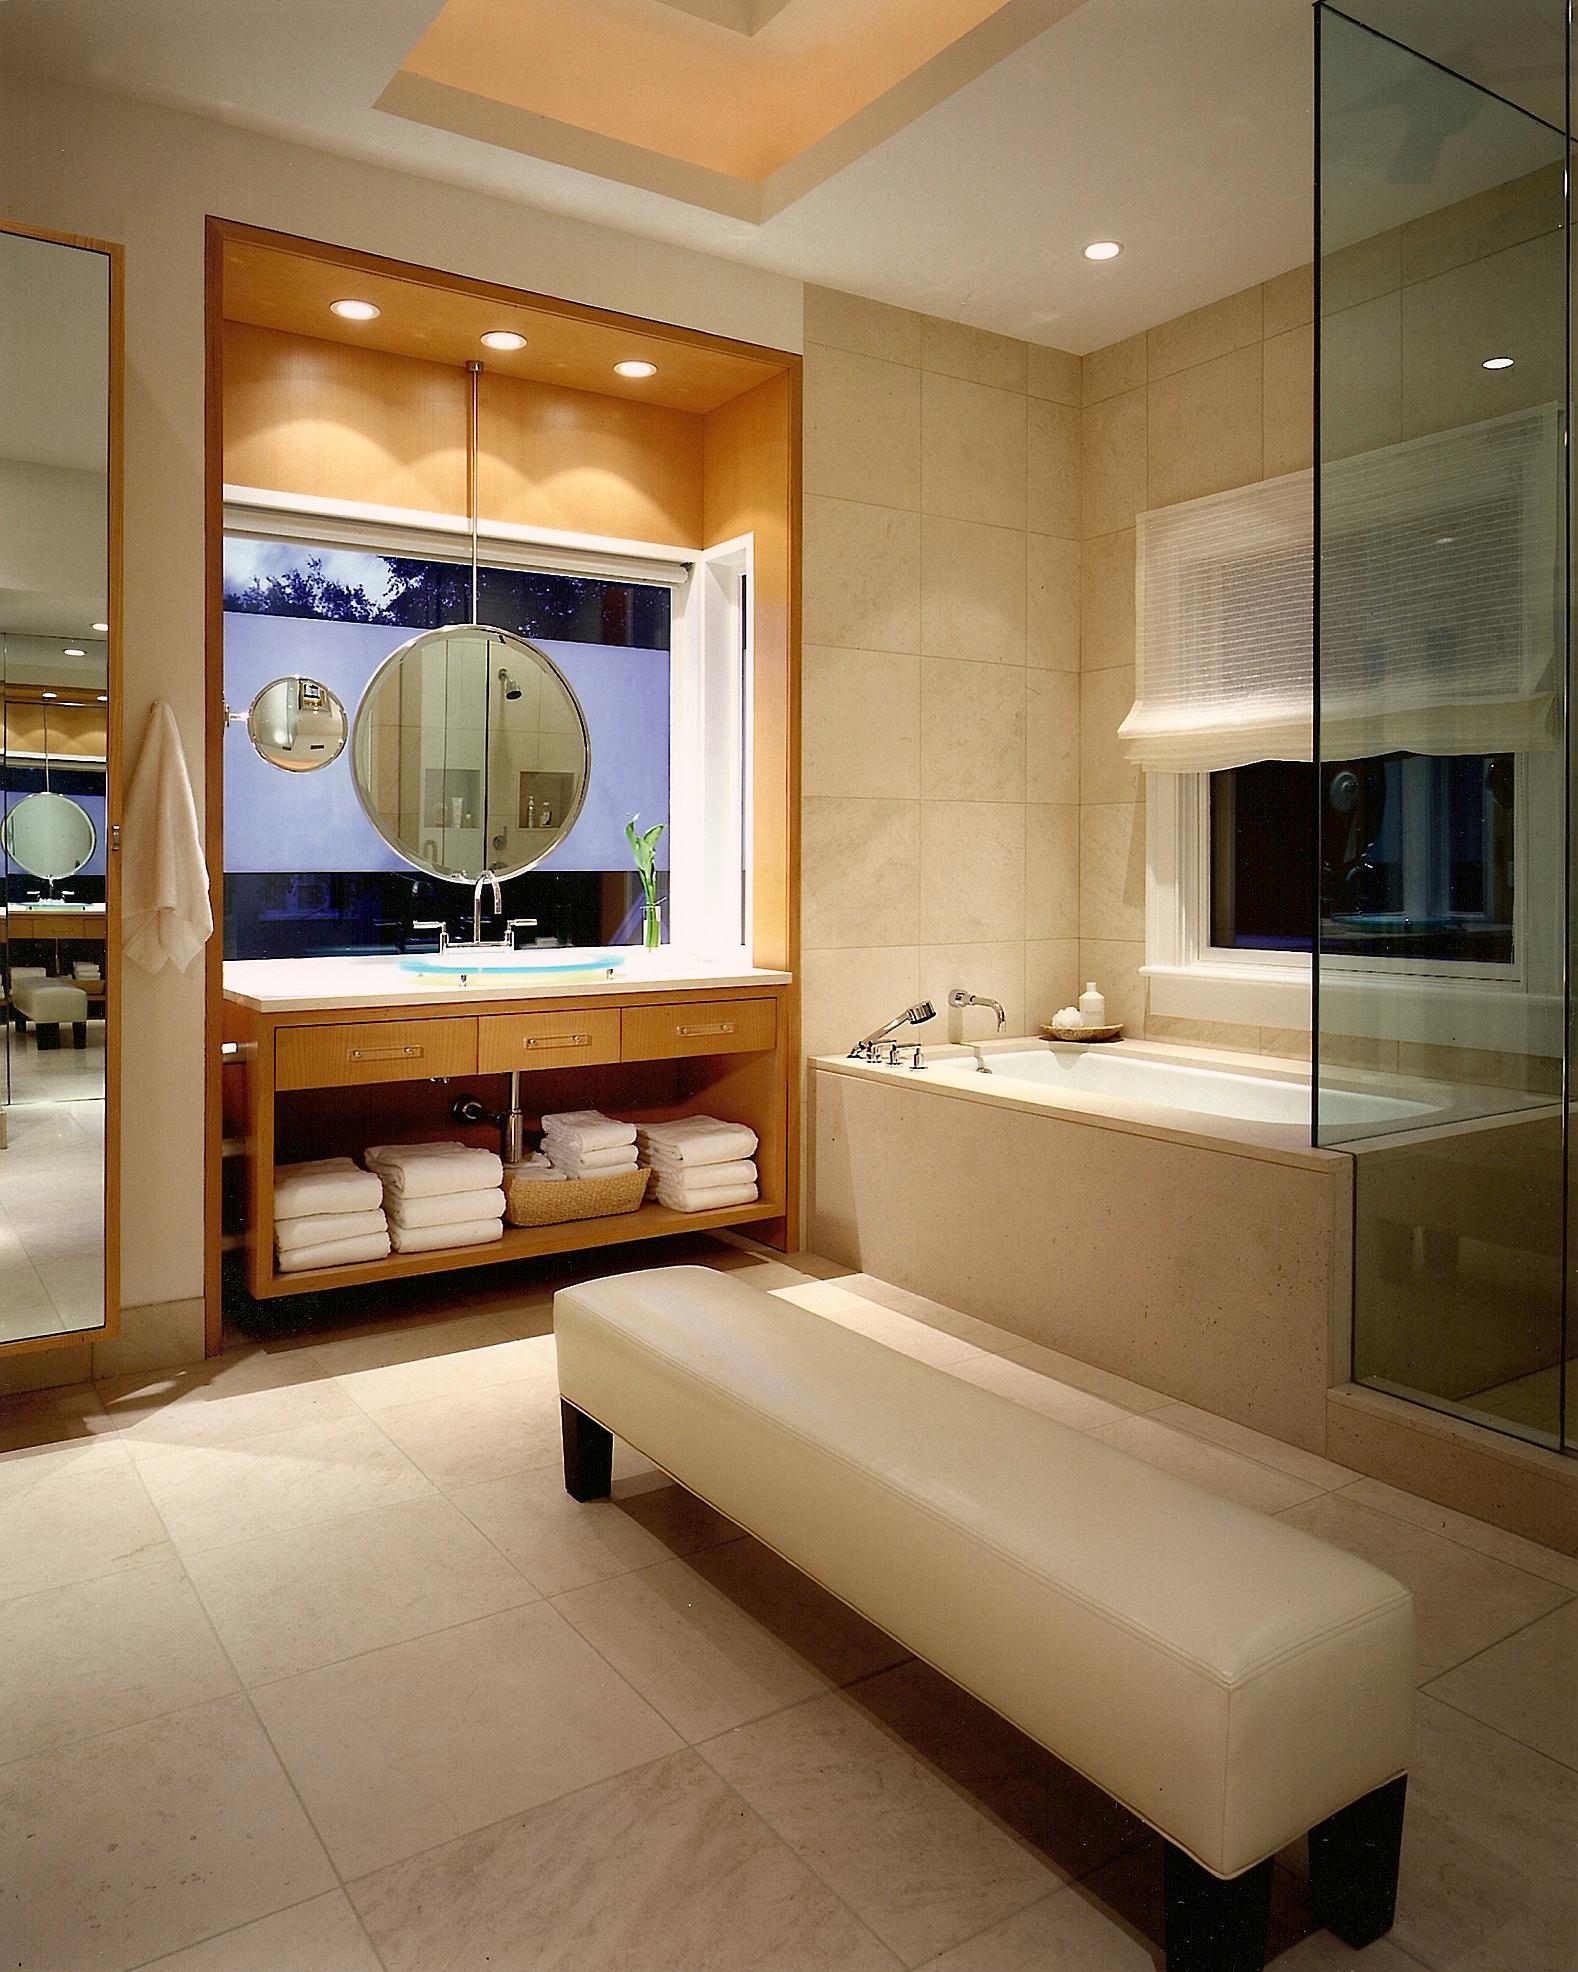 Orleans - master bathroom.jpg